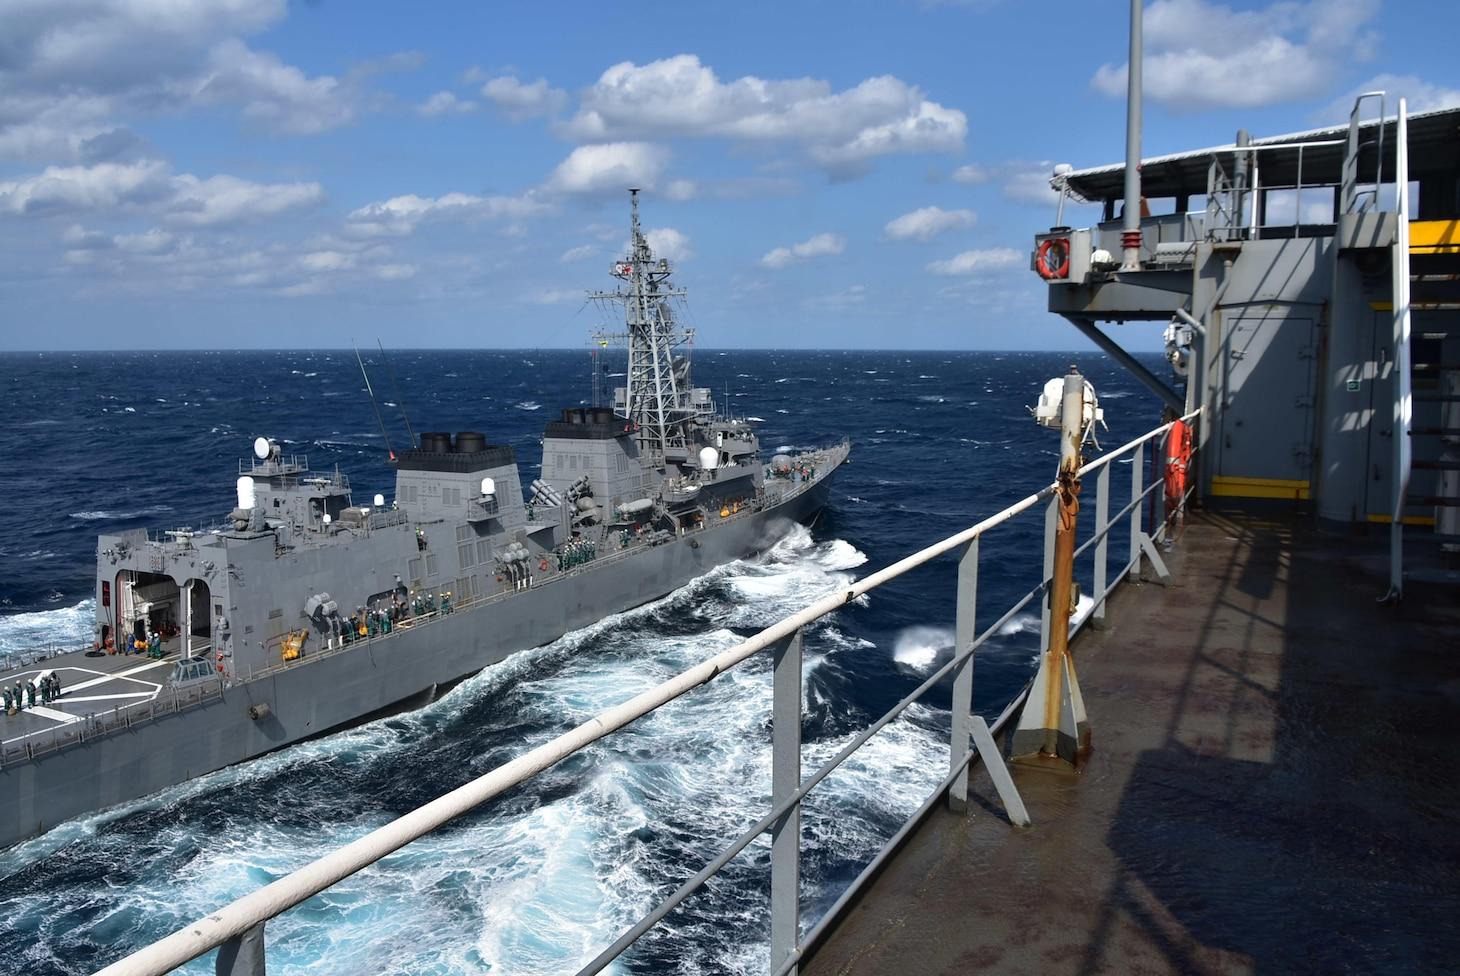 The Japan Maritime Self-Defense Force Murasame-class destroyer JS Ikazuchi (DD 107) steams alongside the U.S. Navy Military Sealift Command Henry J. Kaiser-class fleet replenishment oiler USNS Tippecanoe (T-AO 199) for an underway replenishment during Keen Sword.